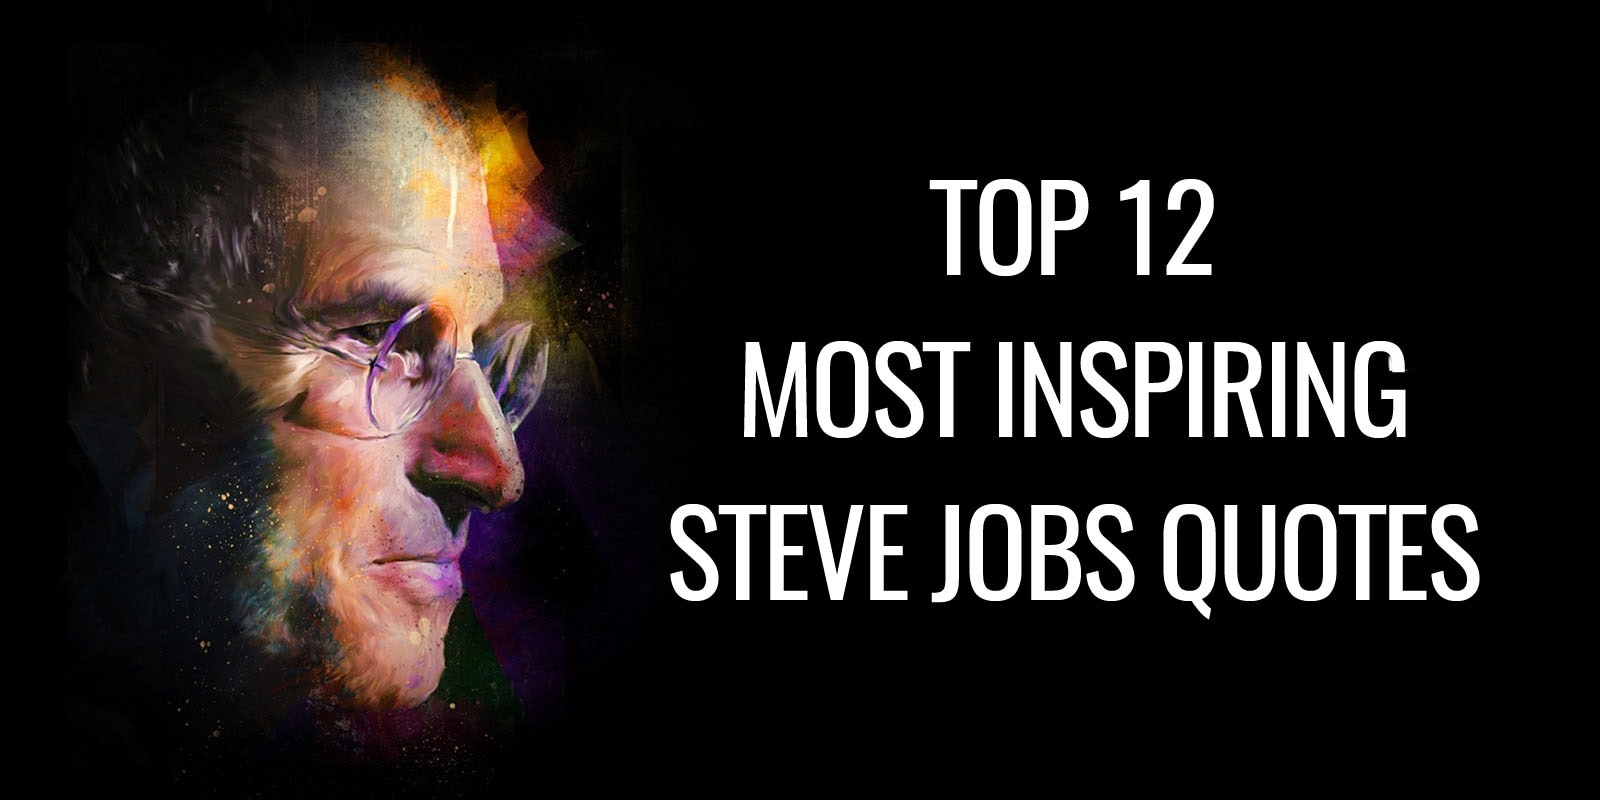 Top 12 Most Inspiring Steve Jobs Quotes